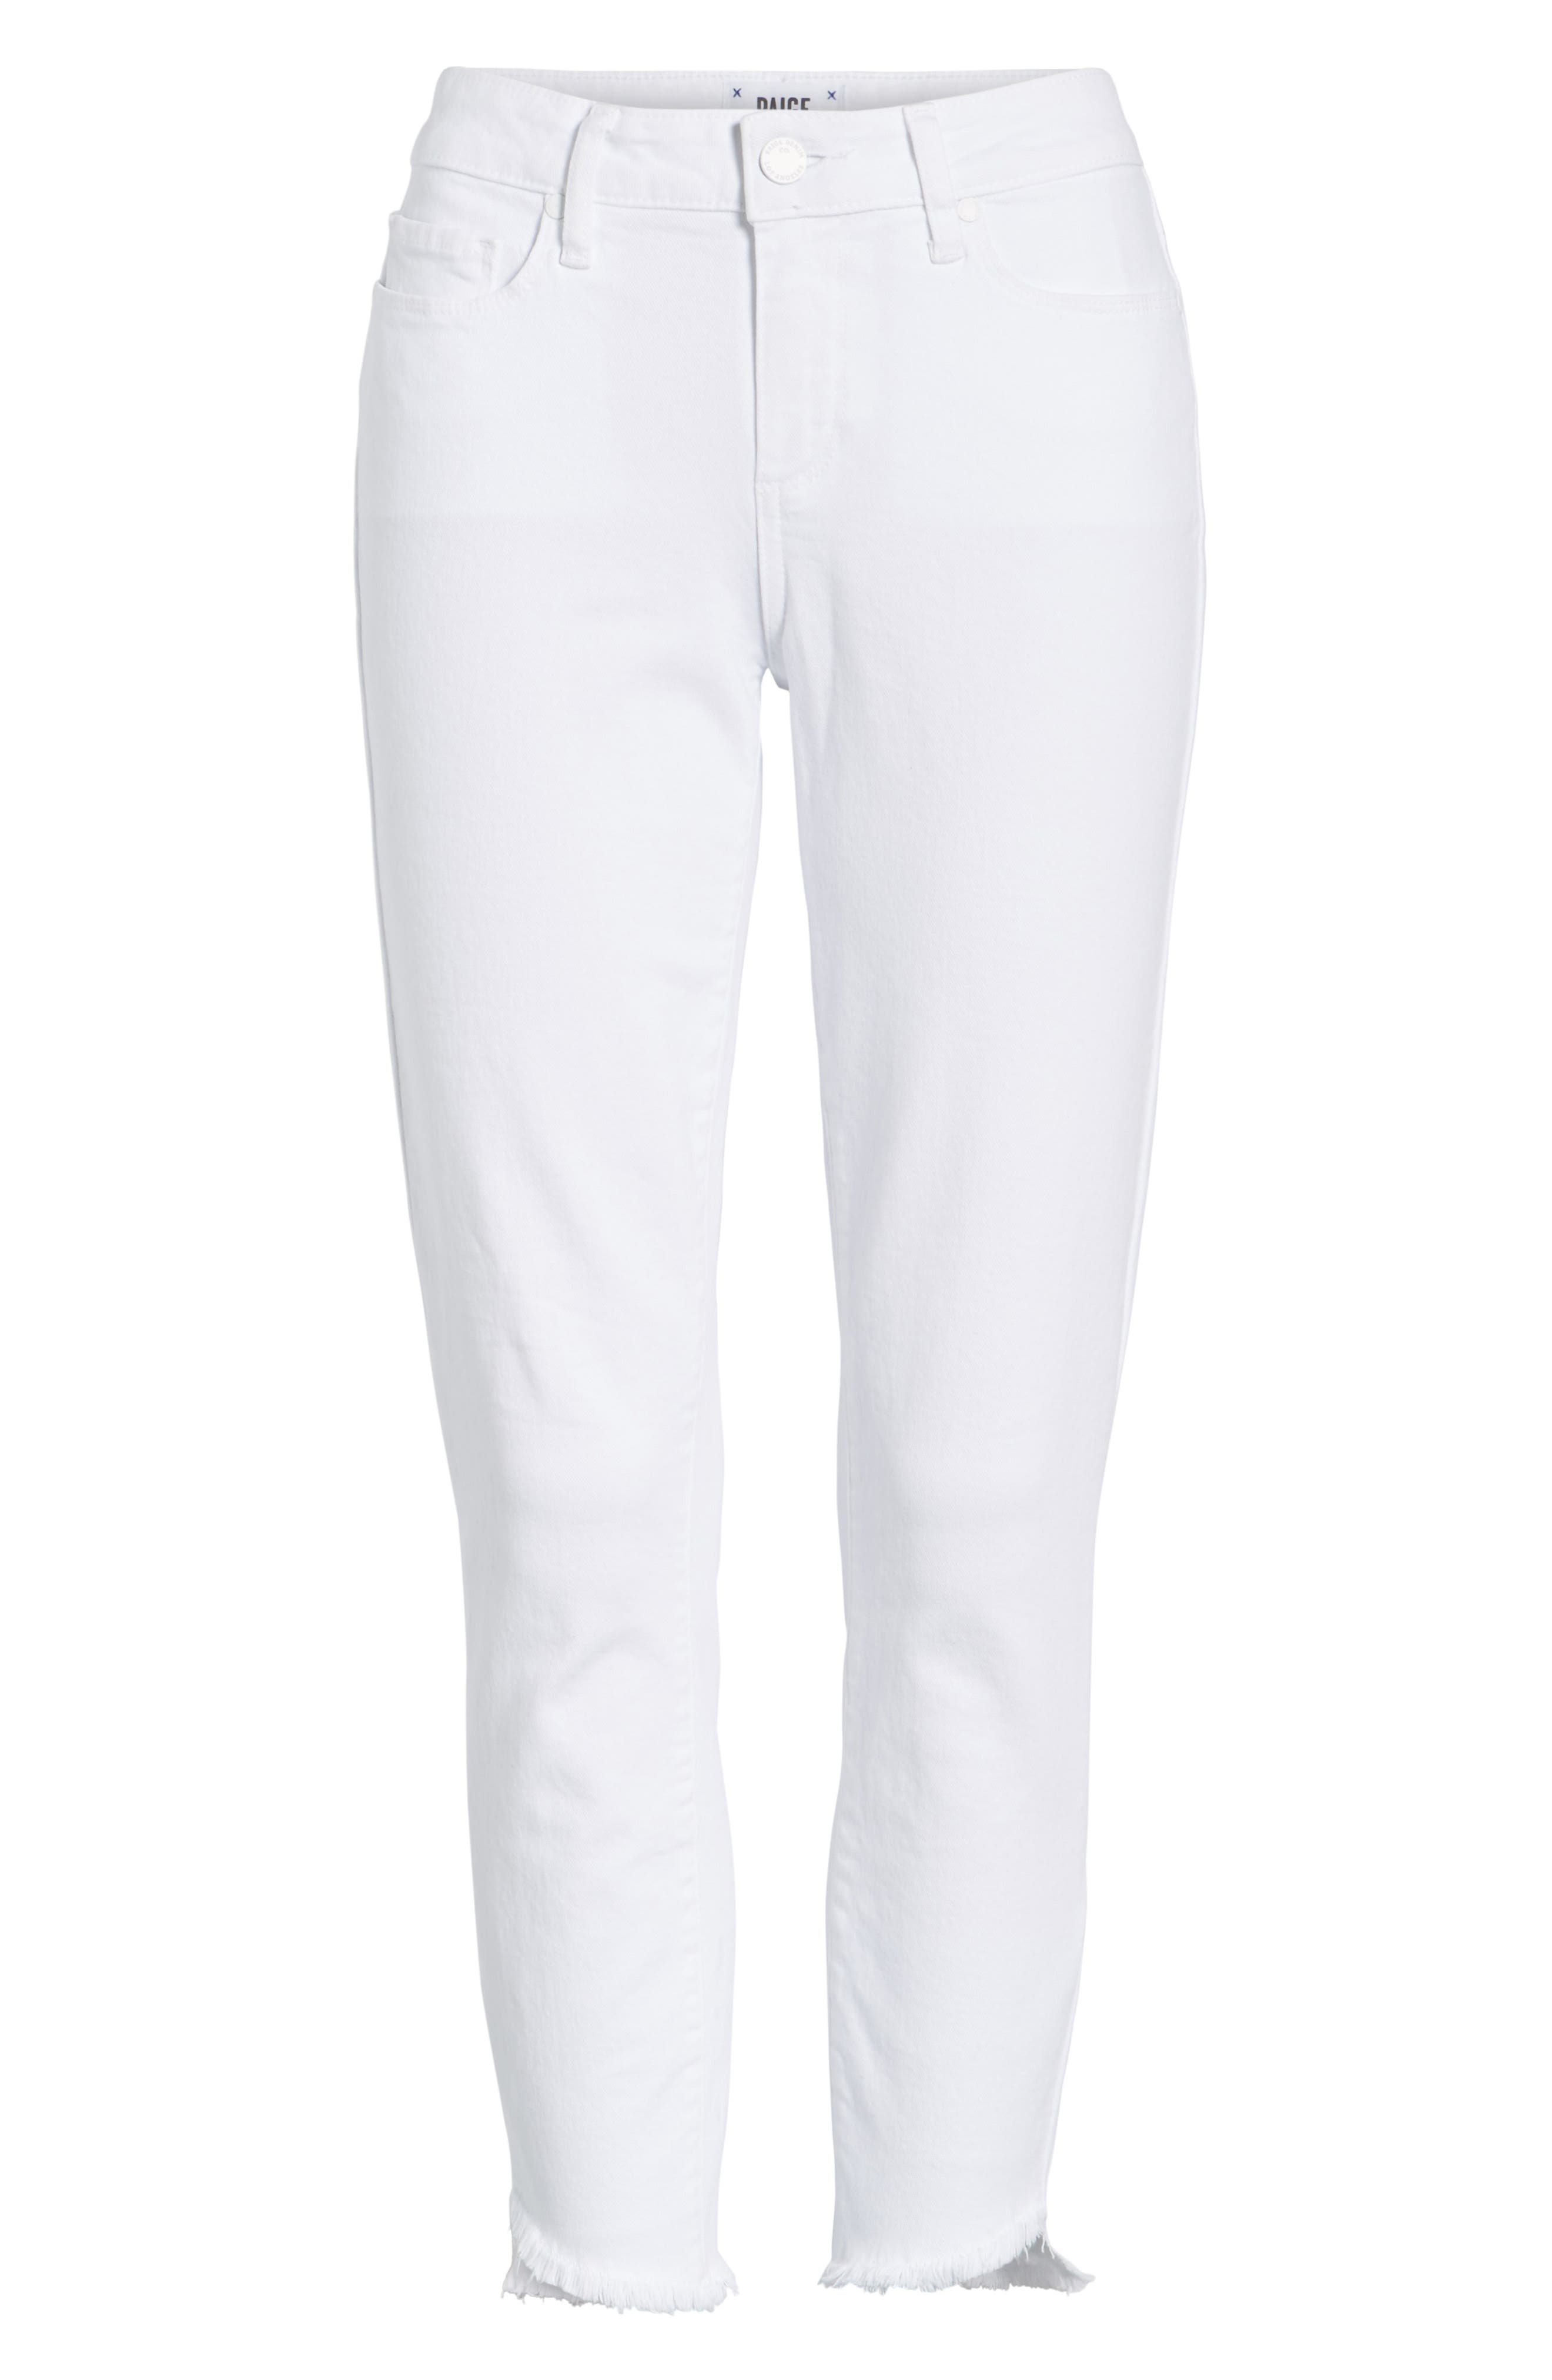 Verdugo Slanted Crop Skinny Jeans,                             Alternate thumbnail 7, color,                             CRISP WHITE